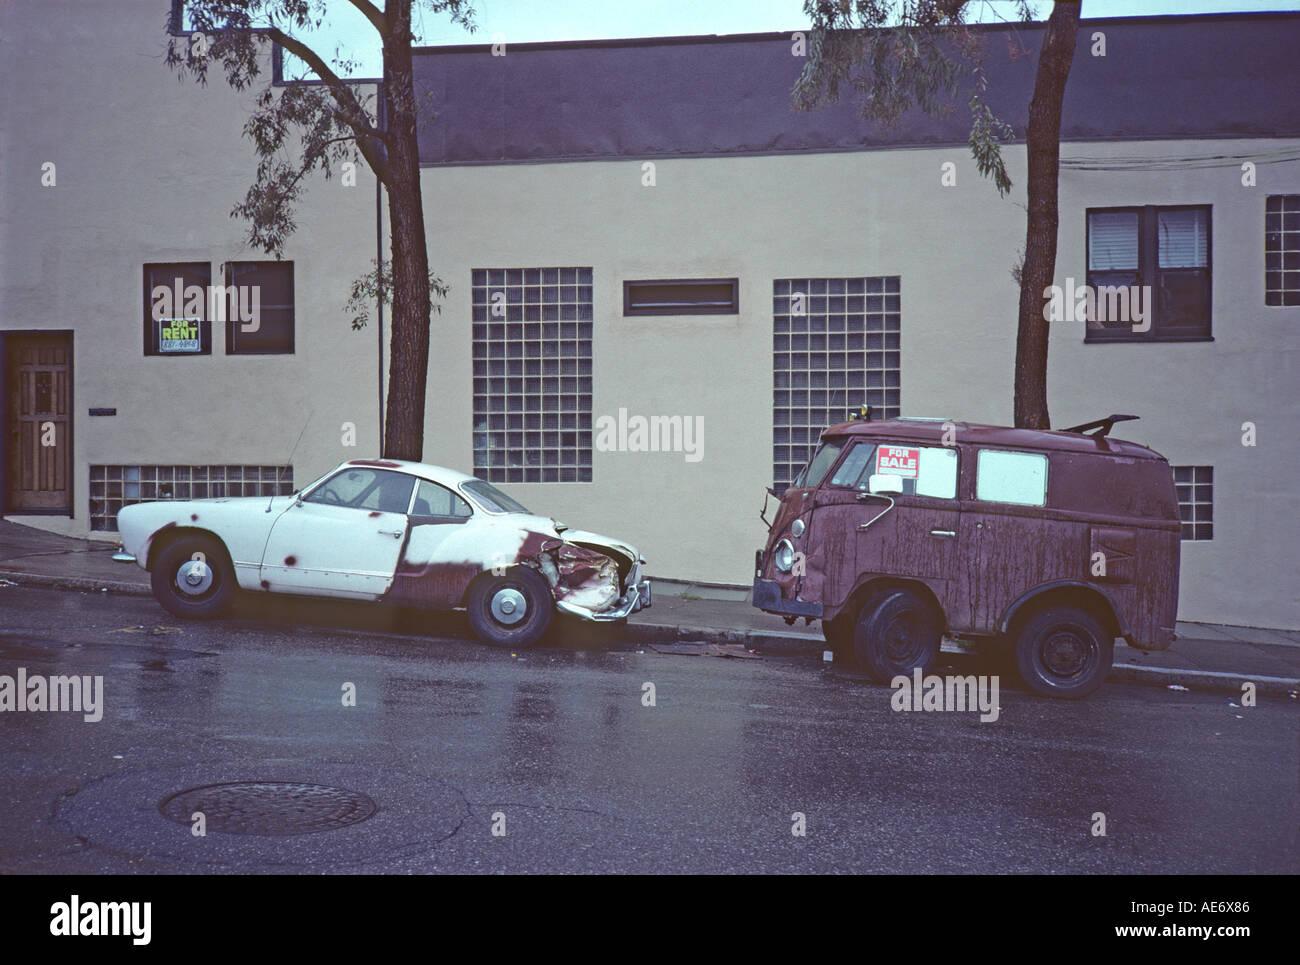 'VW 'Karman Ghia' 2 door coupé and ^shortened VW van, 'San Francisco' California' - Stock Image